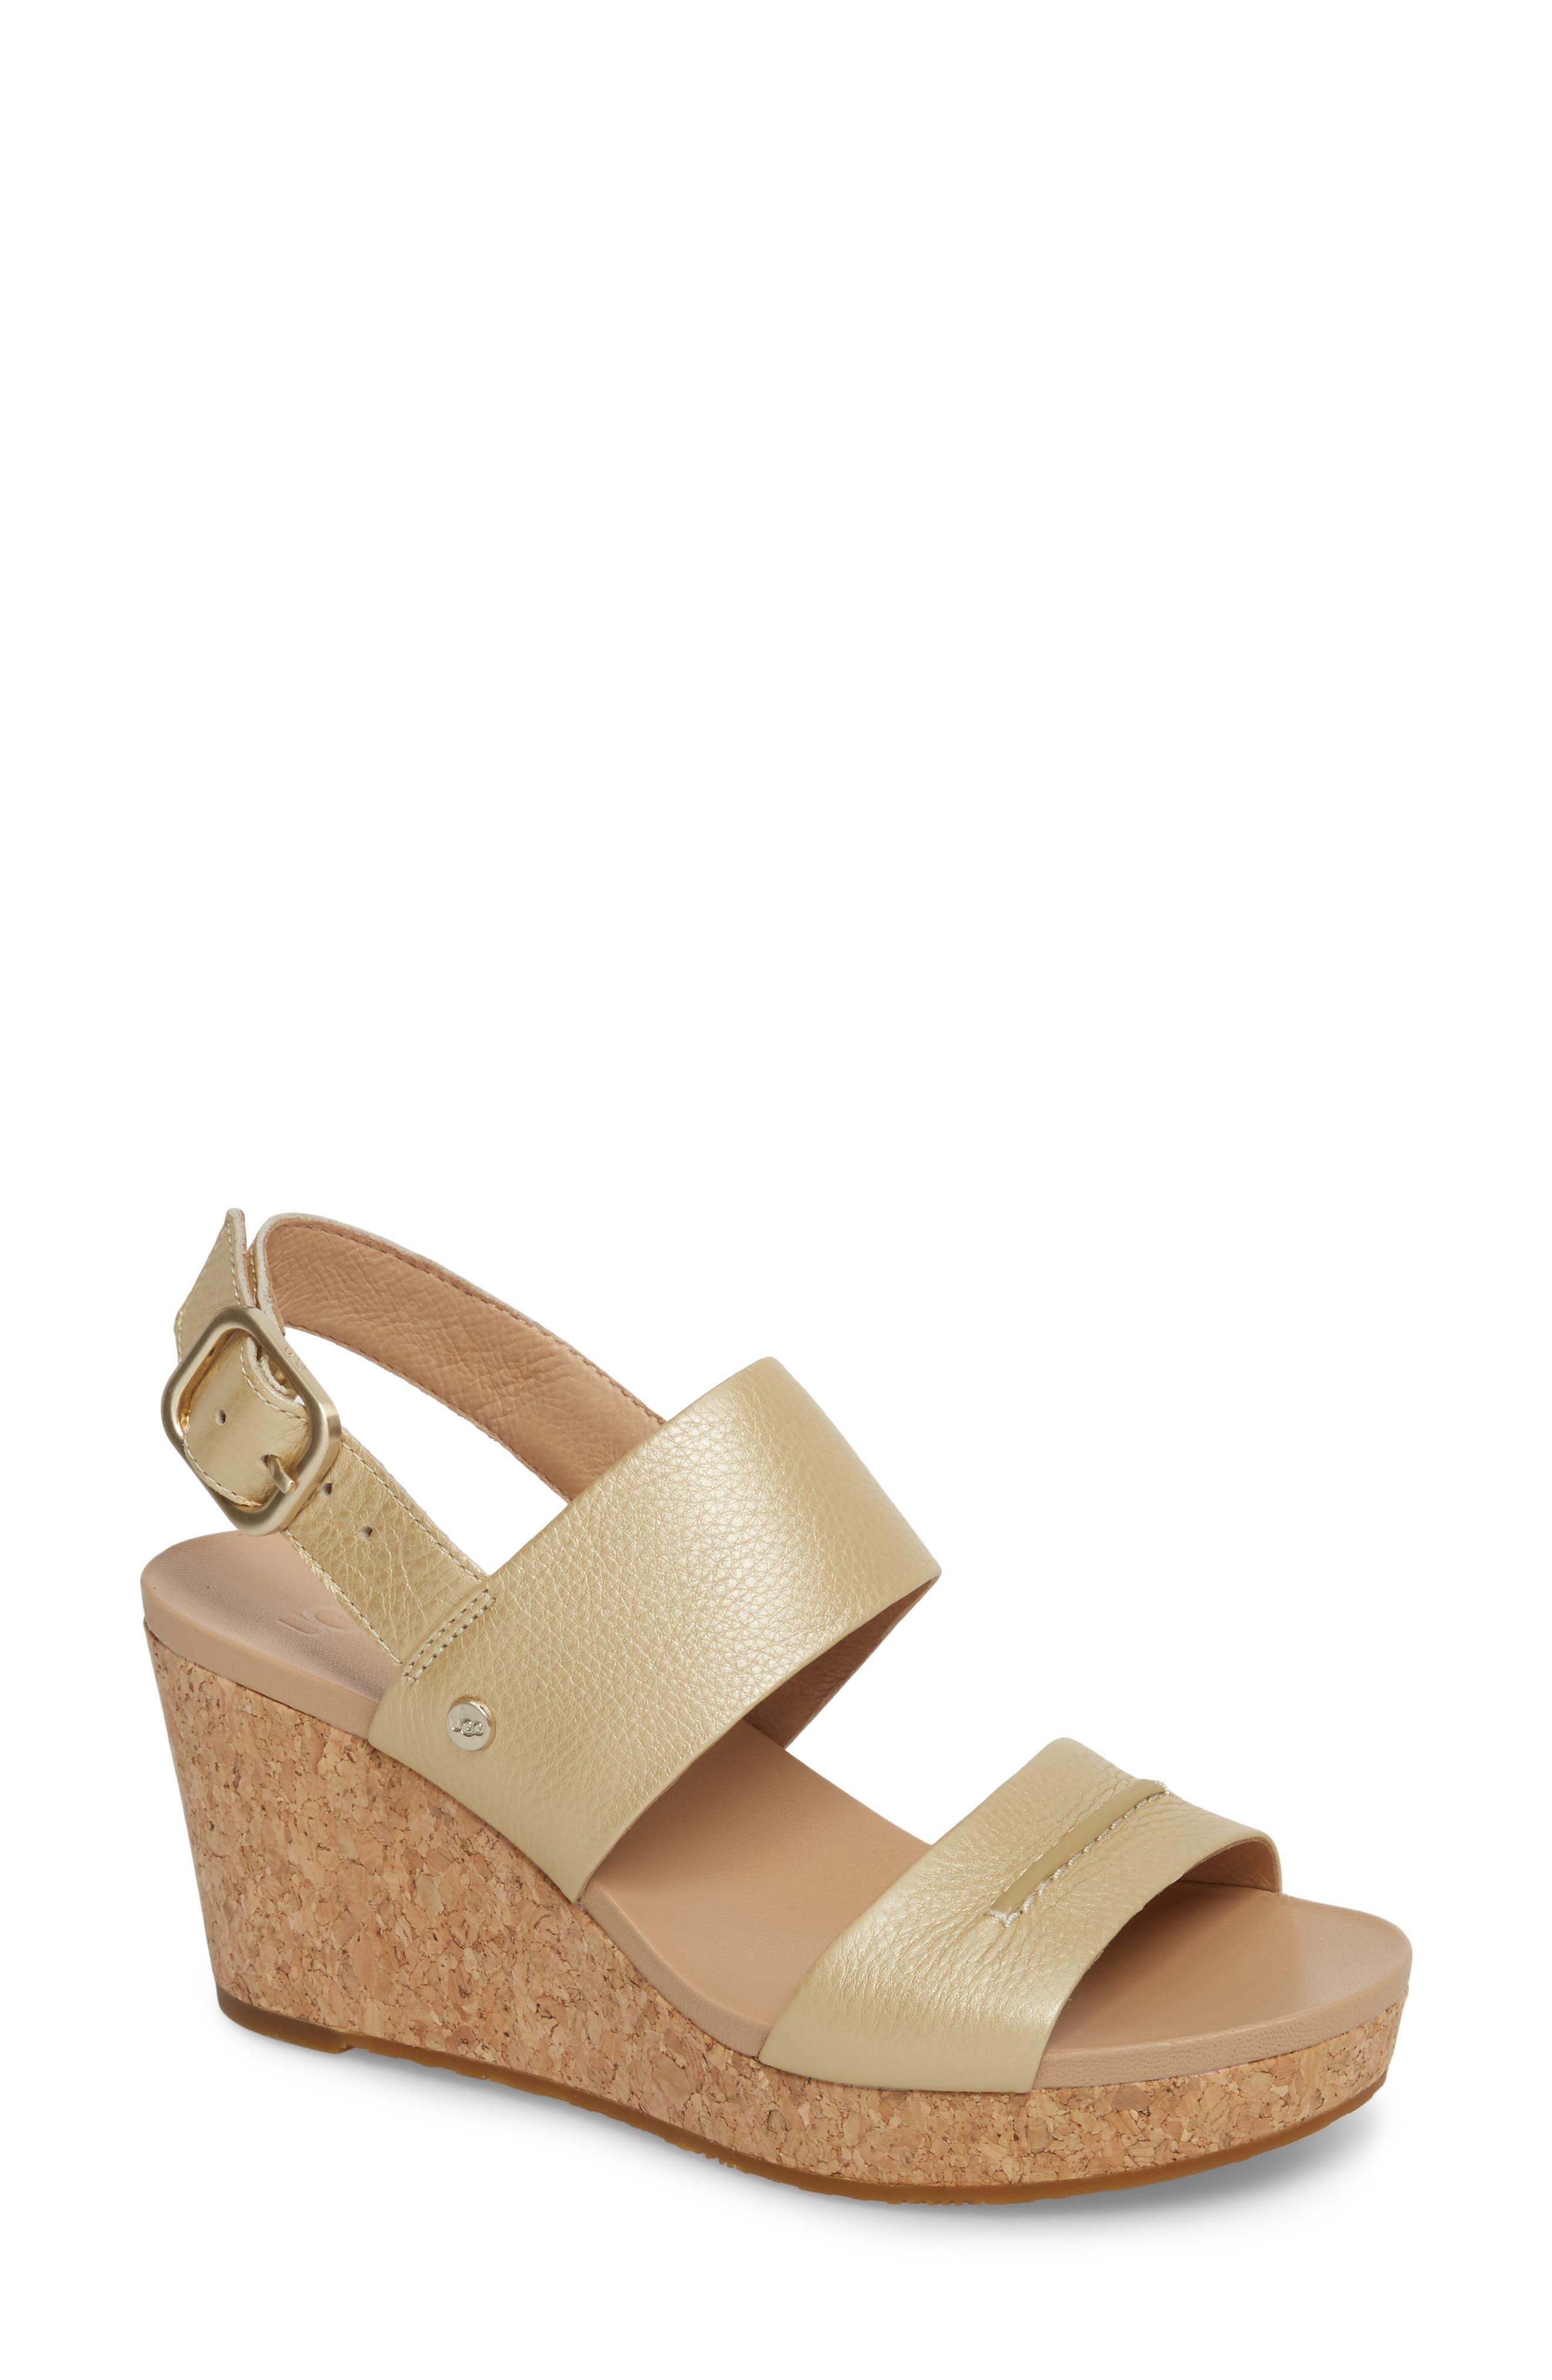 UGG<SUP>®</SUP> Elena II Metallic Platform Wedge Sandal, Main, color, 710